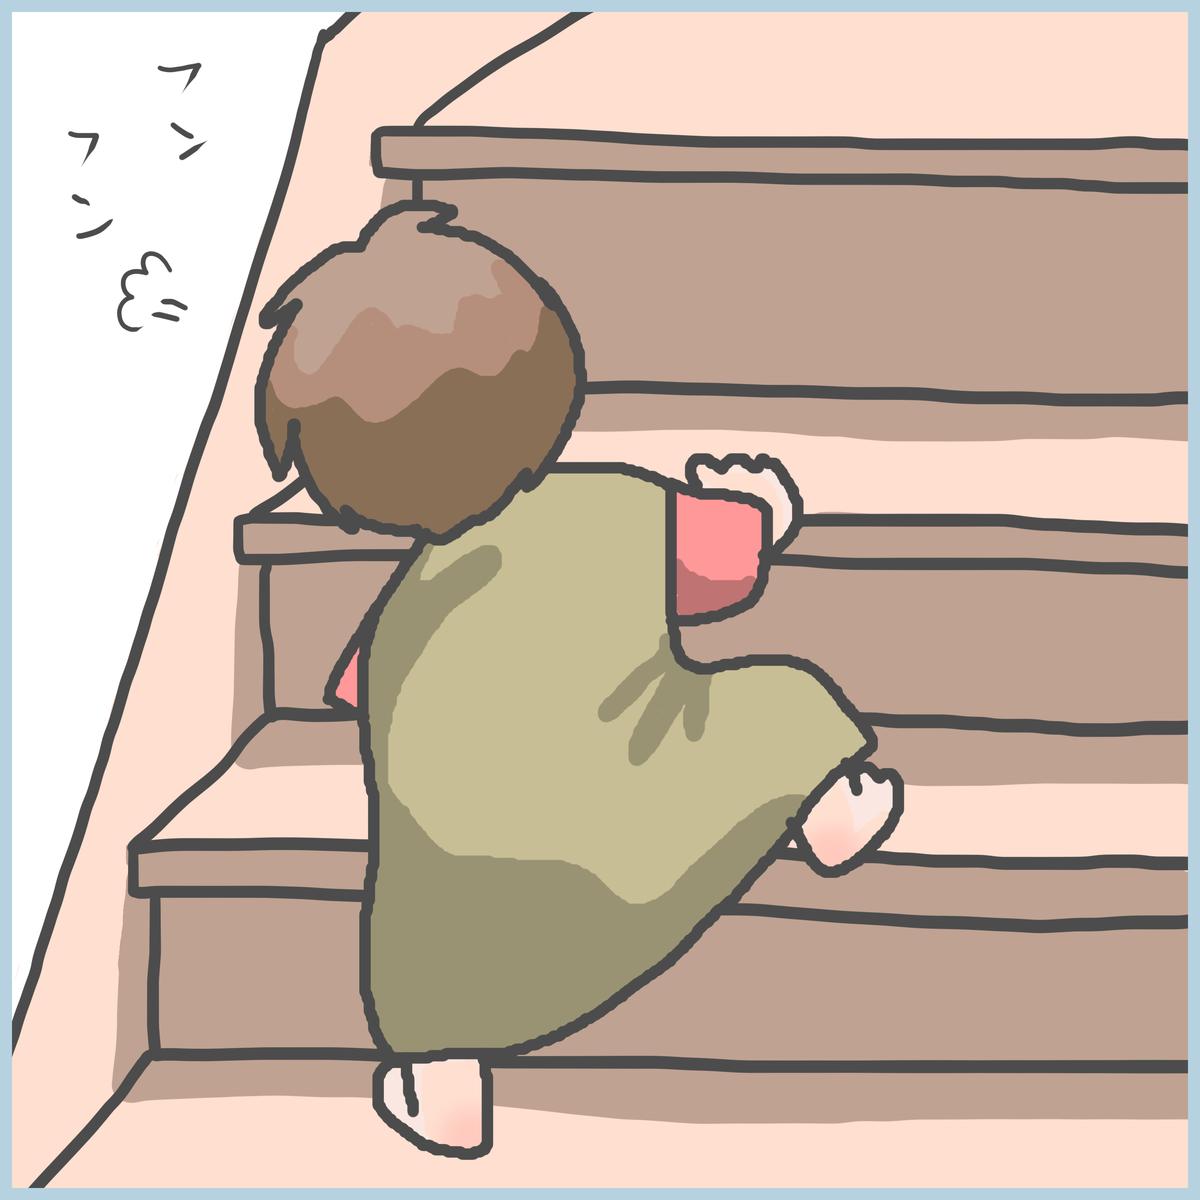 f:id:ika_yoshi:20201206005110j:plain